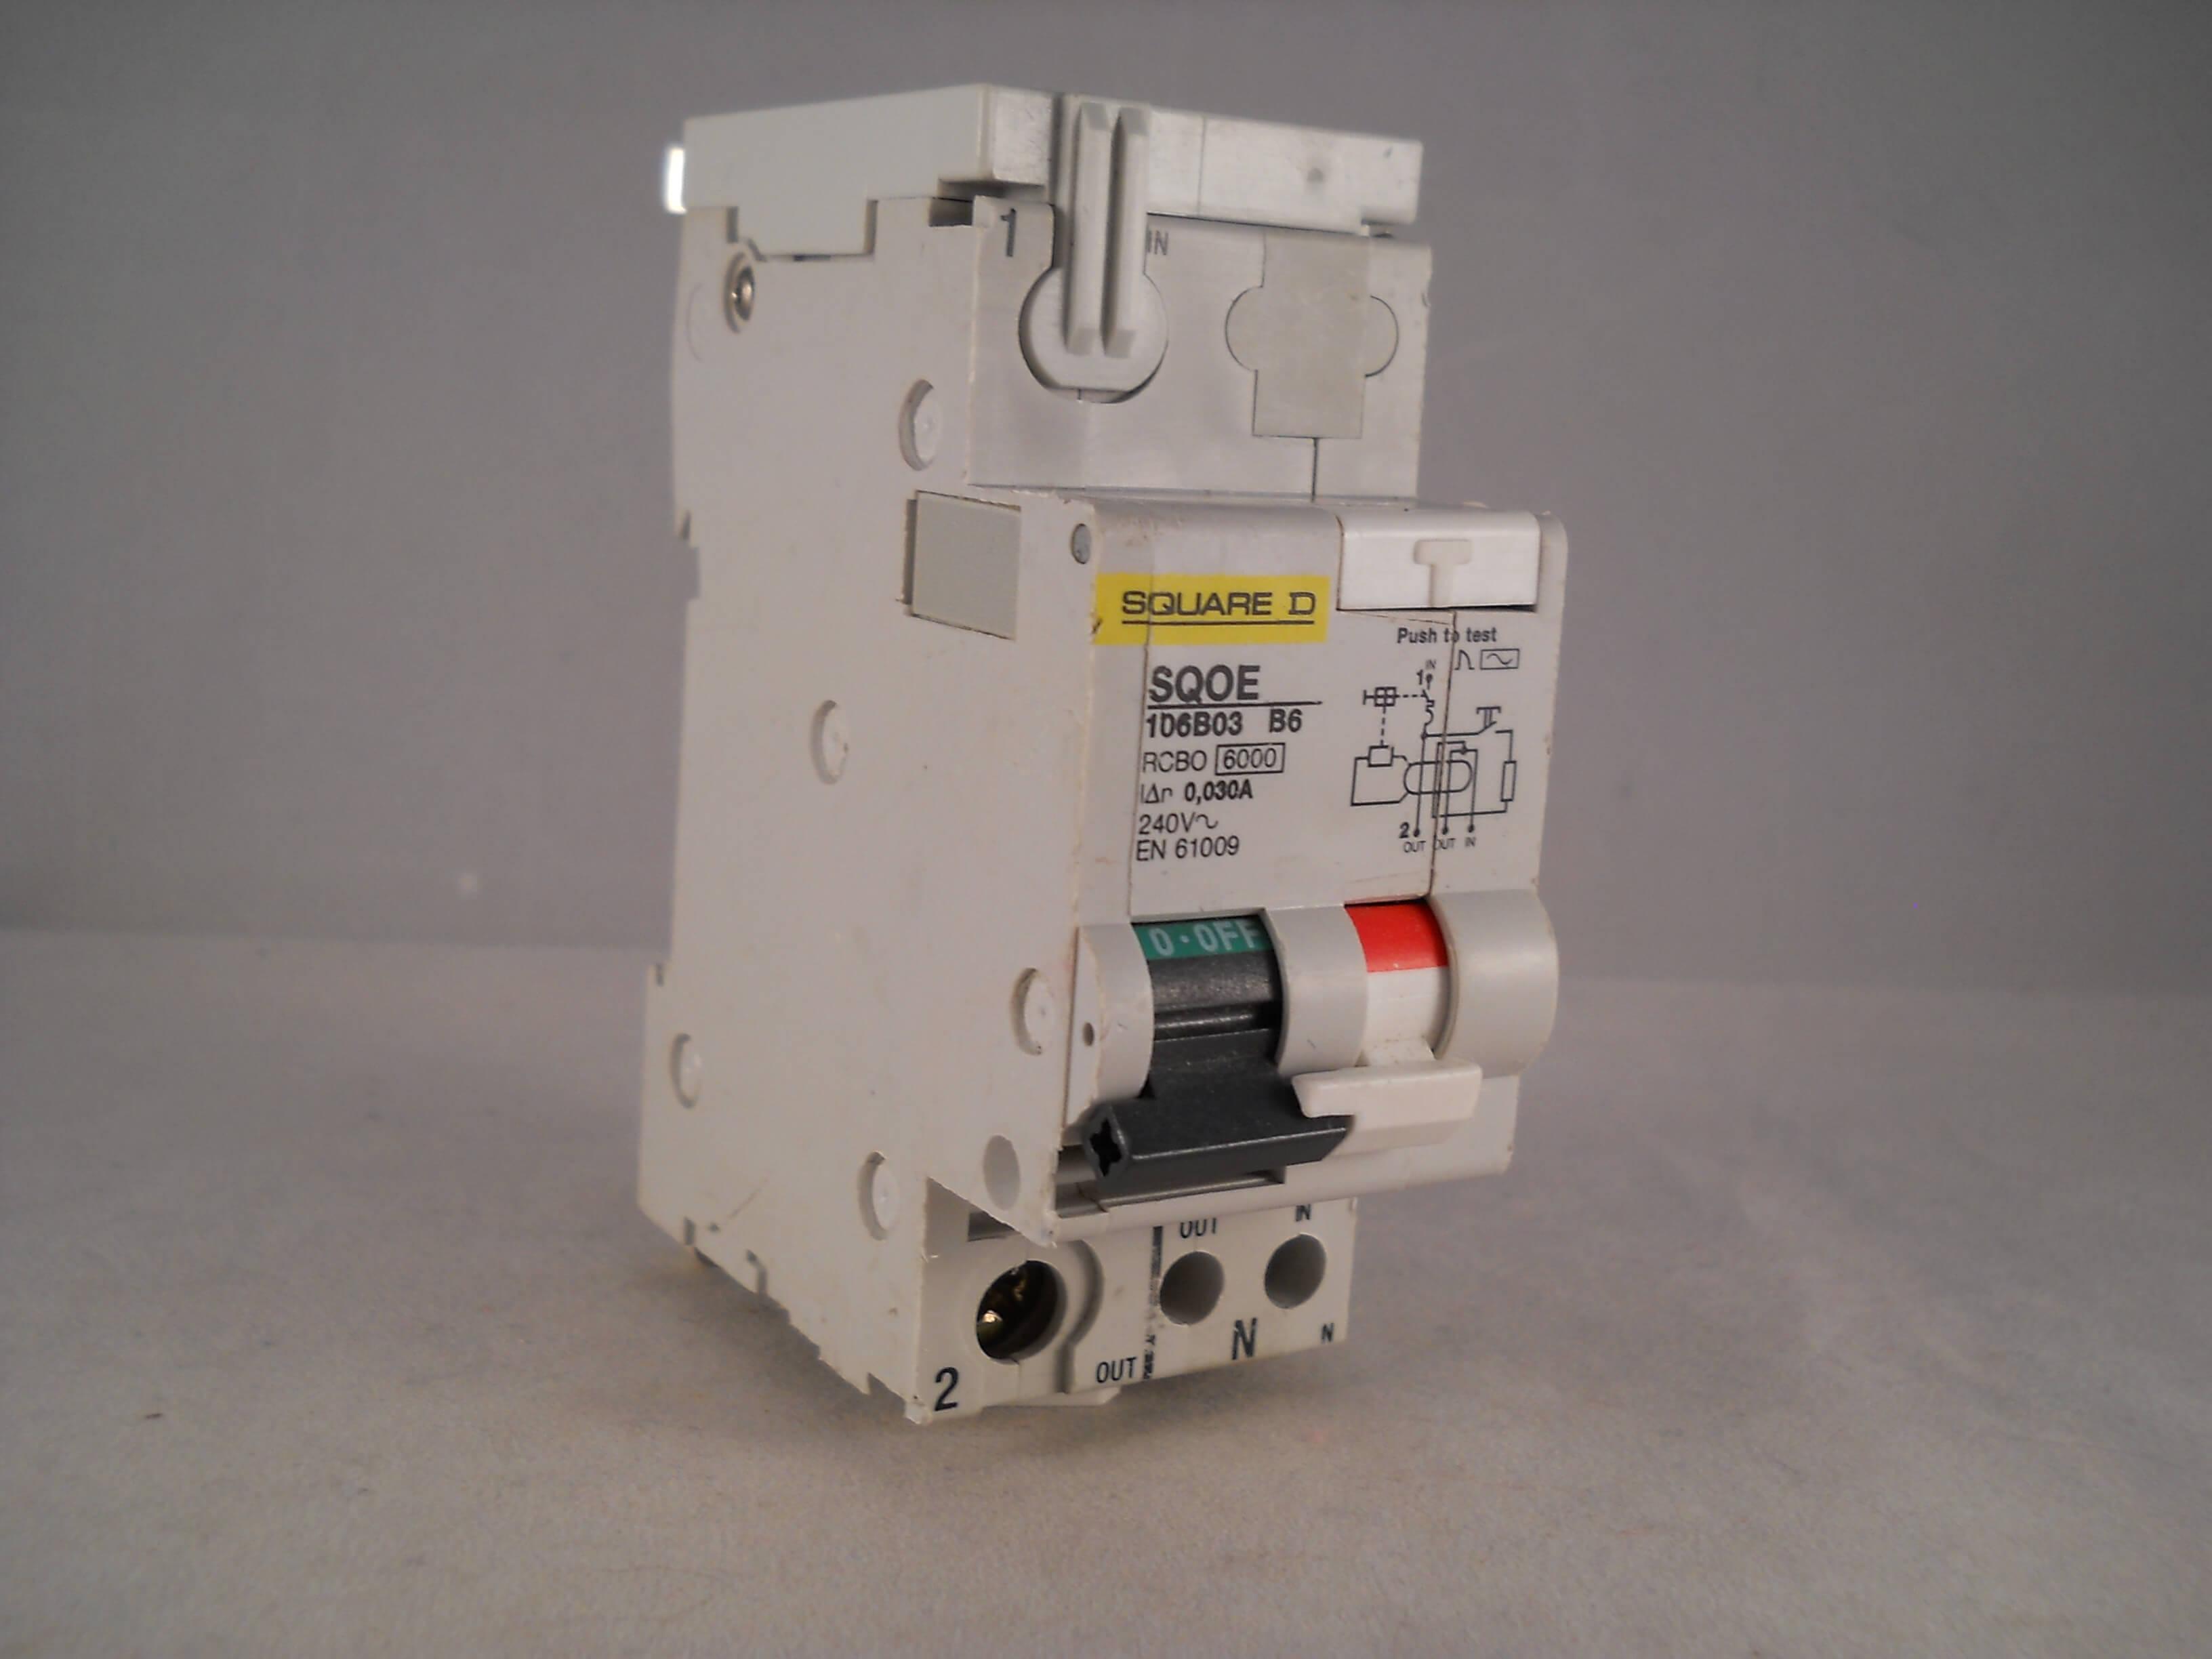 square d rcbo 6 amp 30ma type b 6a sqoe qwikline schneider rh willrose electrical co uk Automotive Fuse Box Duramax Fuse Box Universal